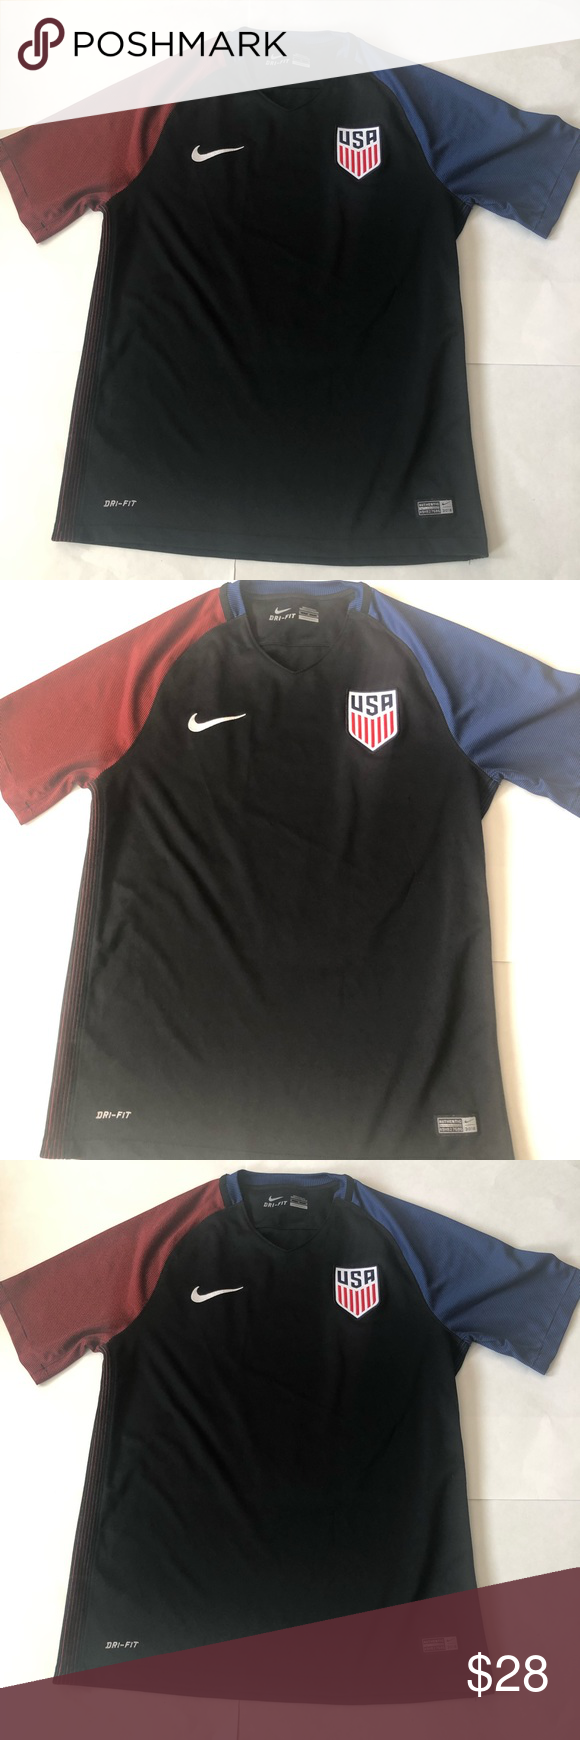 af4554e9 Nike Shirts Tees - Short Sleeve · Nike Team USA Dri Fit Soccer Jersey Size  Medium Nike Team USA Dri Fit Soccer Jersey